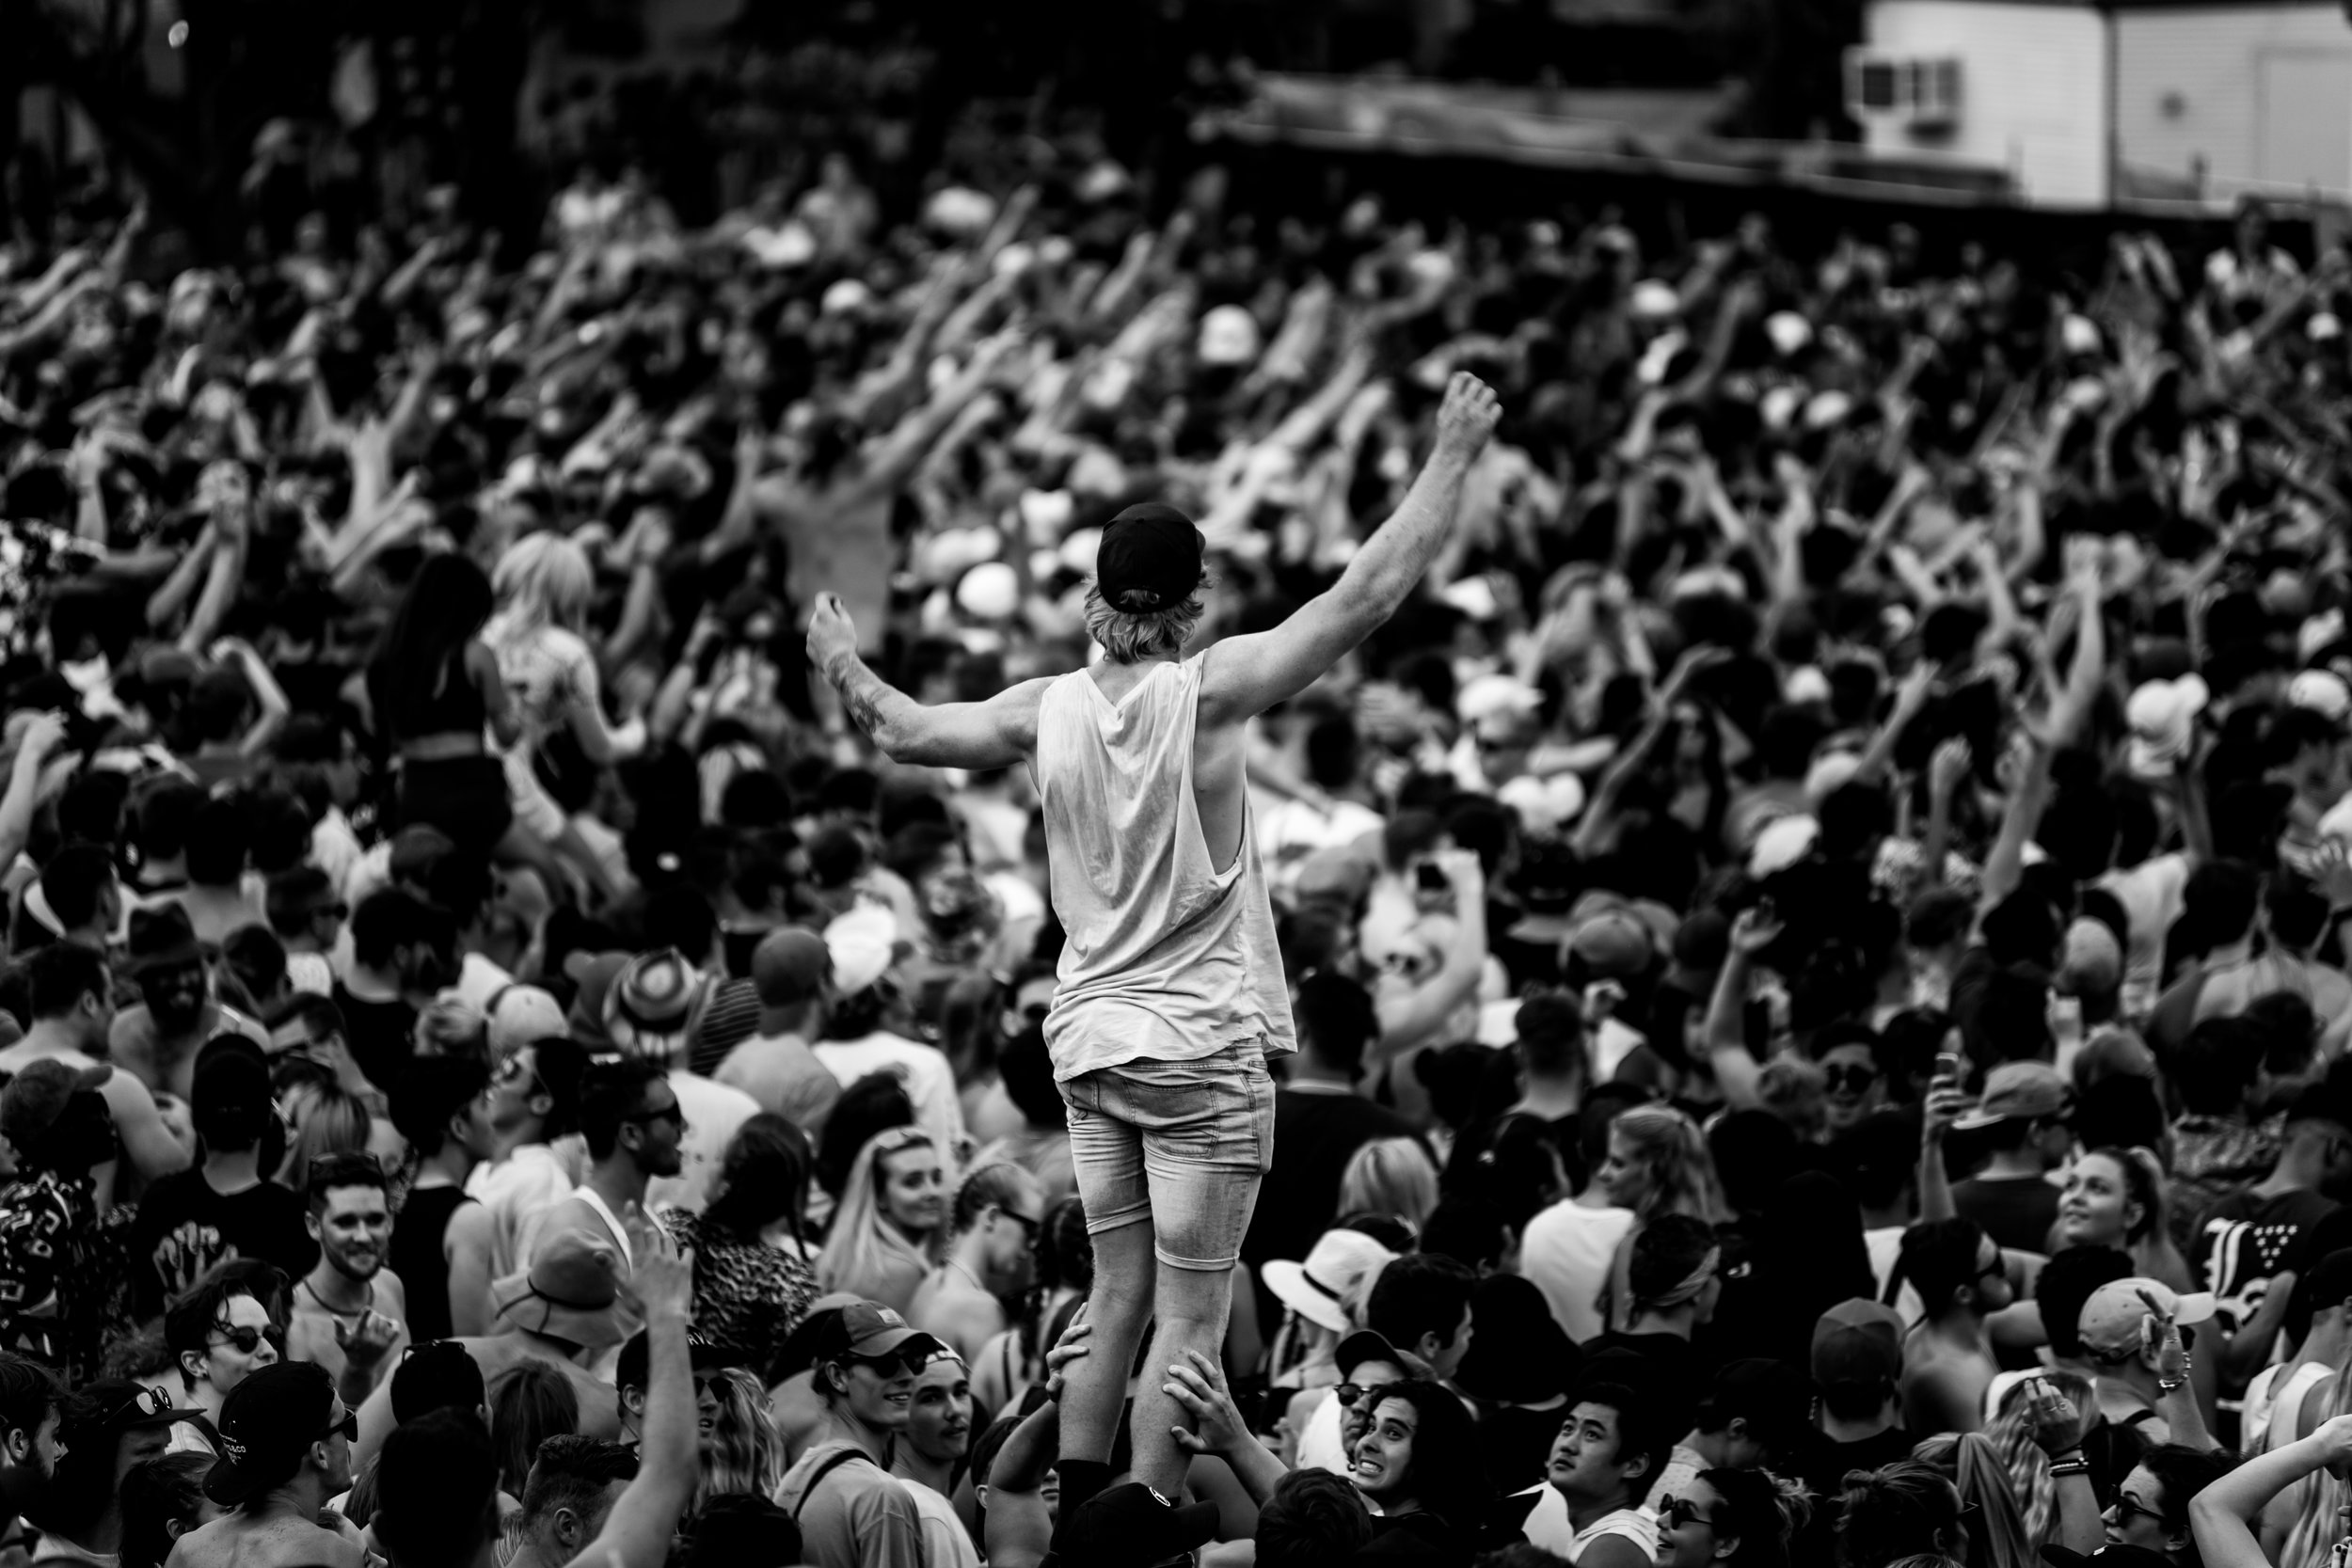 Fomo Crowd